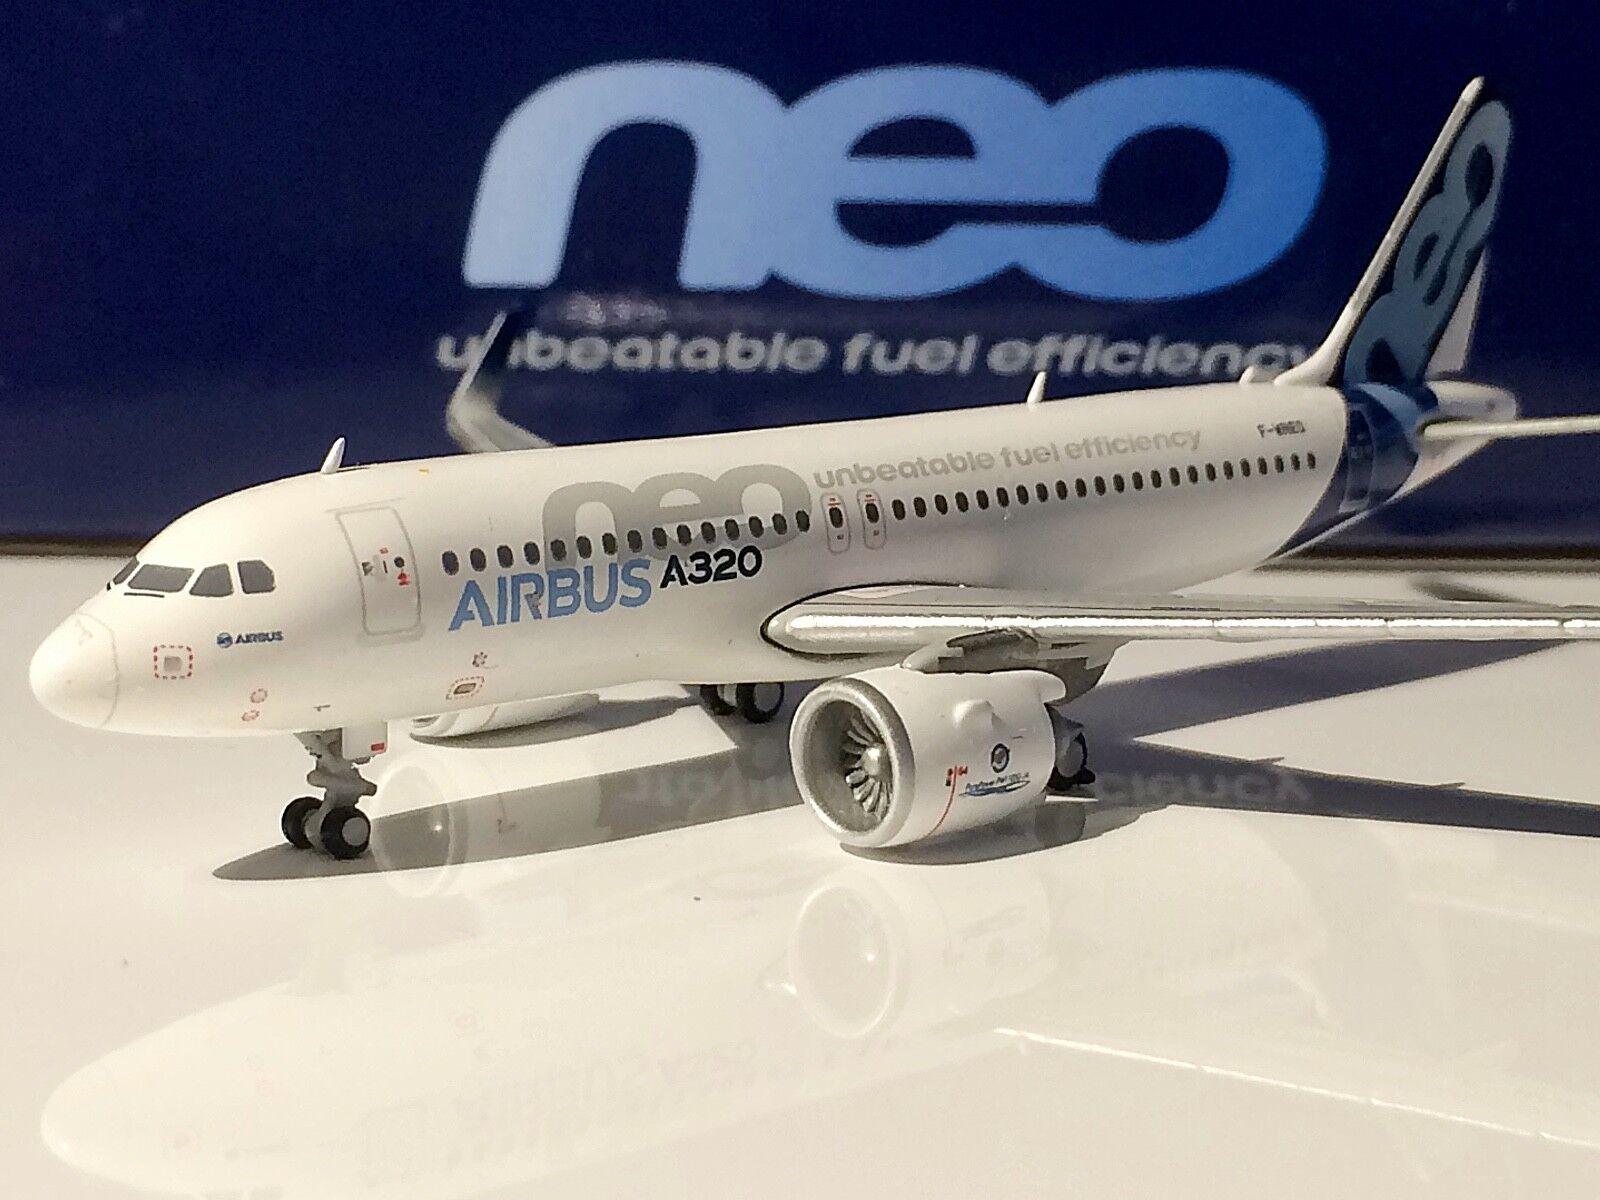 JC Wings Wings Wings 1 400 Airbus Industries Airbus A320Neo F-WNEO AVIATIONMODELSHOP    Haben Wir Lob Von Kunden Gewonnen  1aa15c